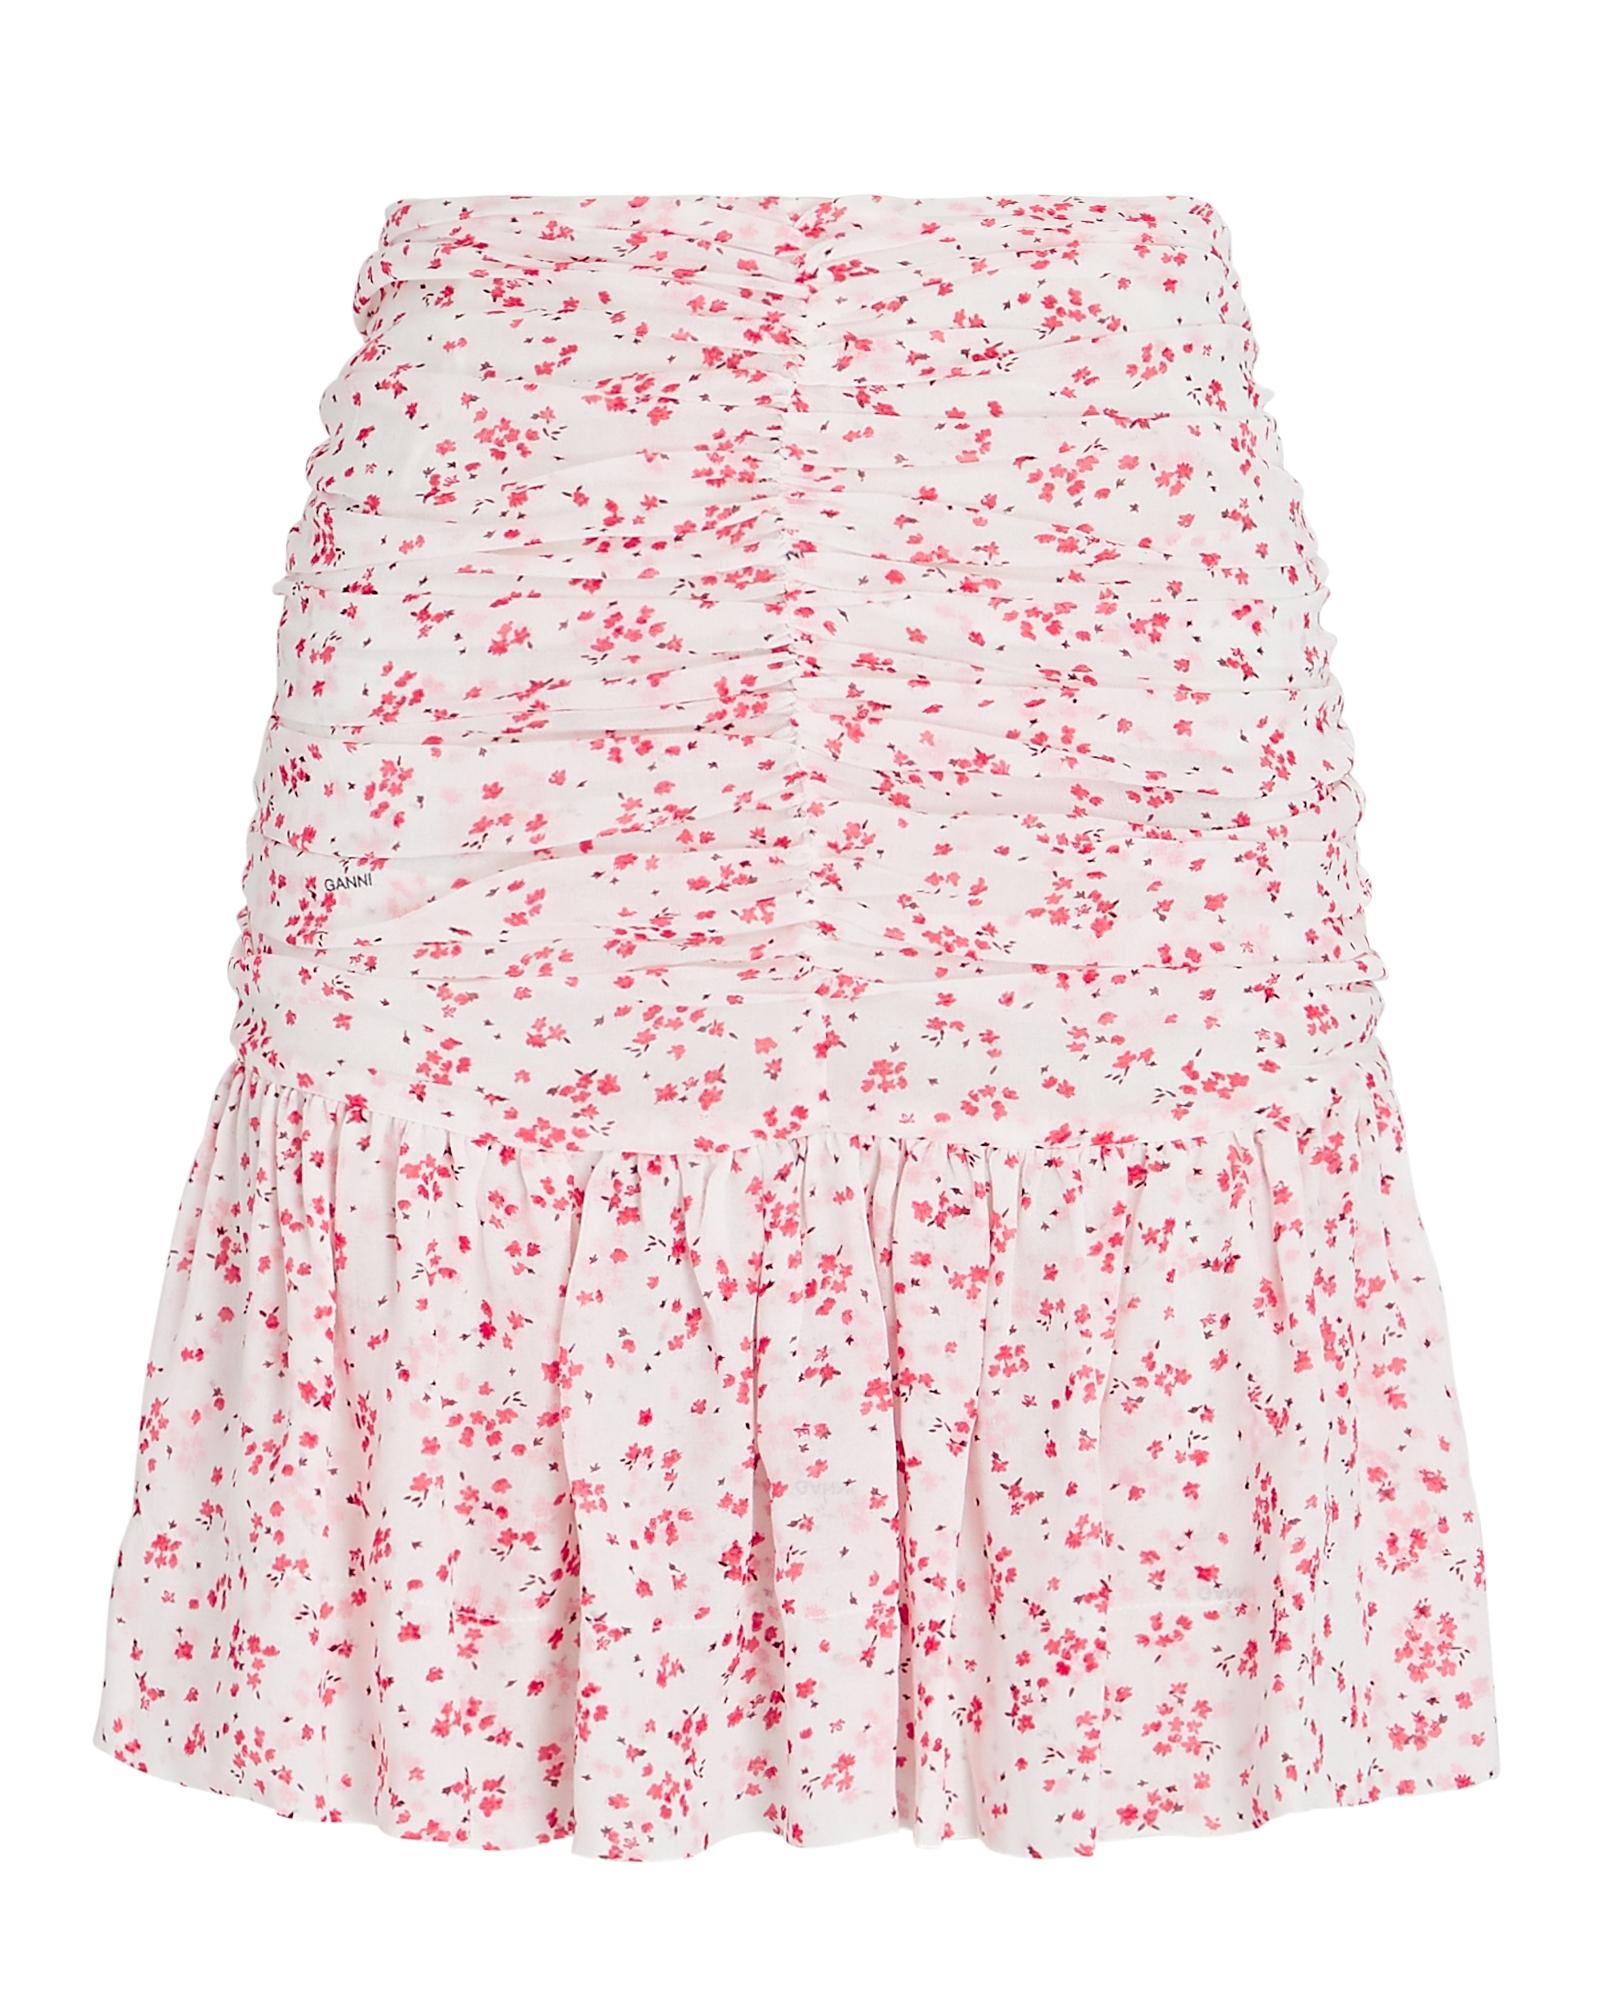 Ganni Mini skirts Ruched Floral Georgette Mini Skirt